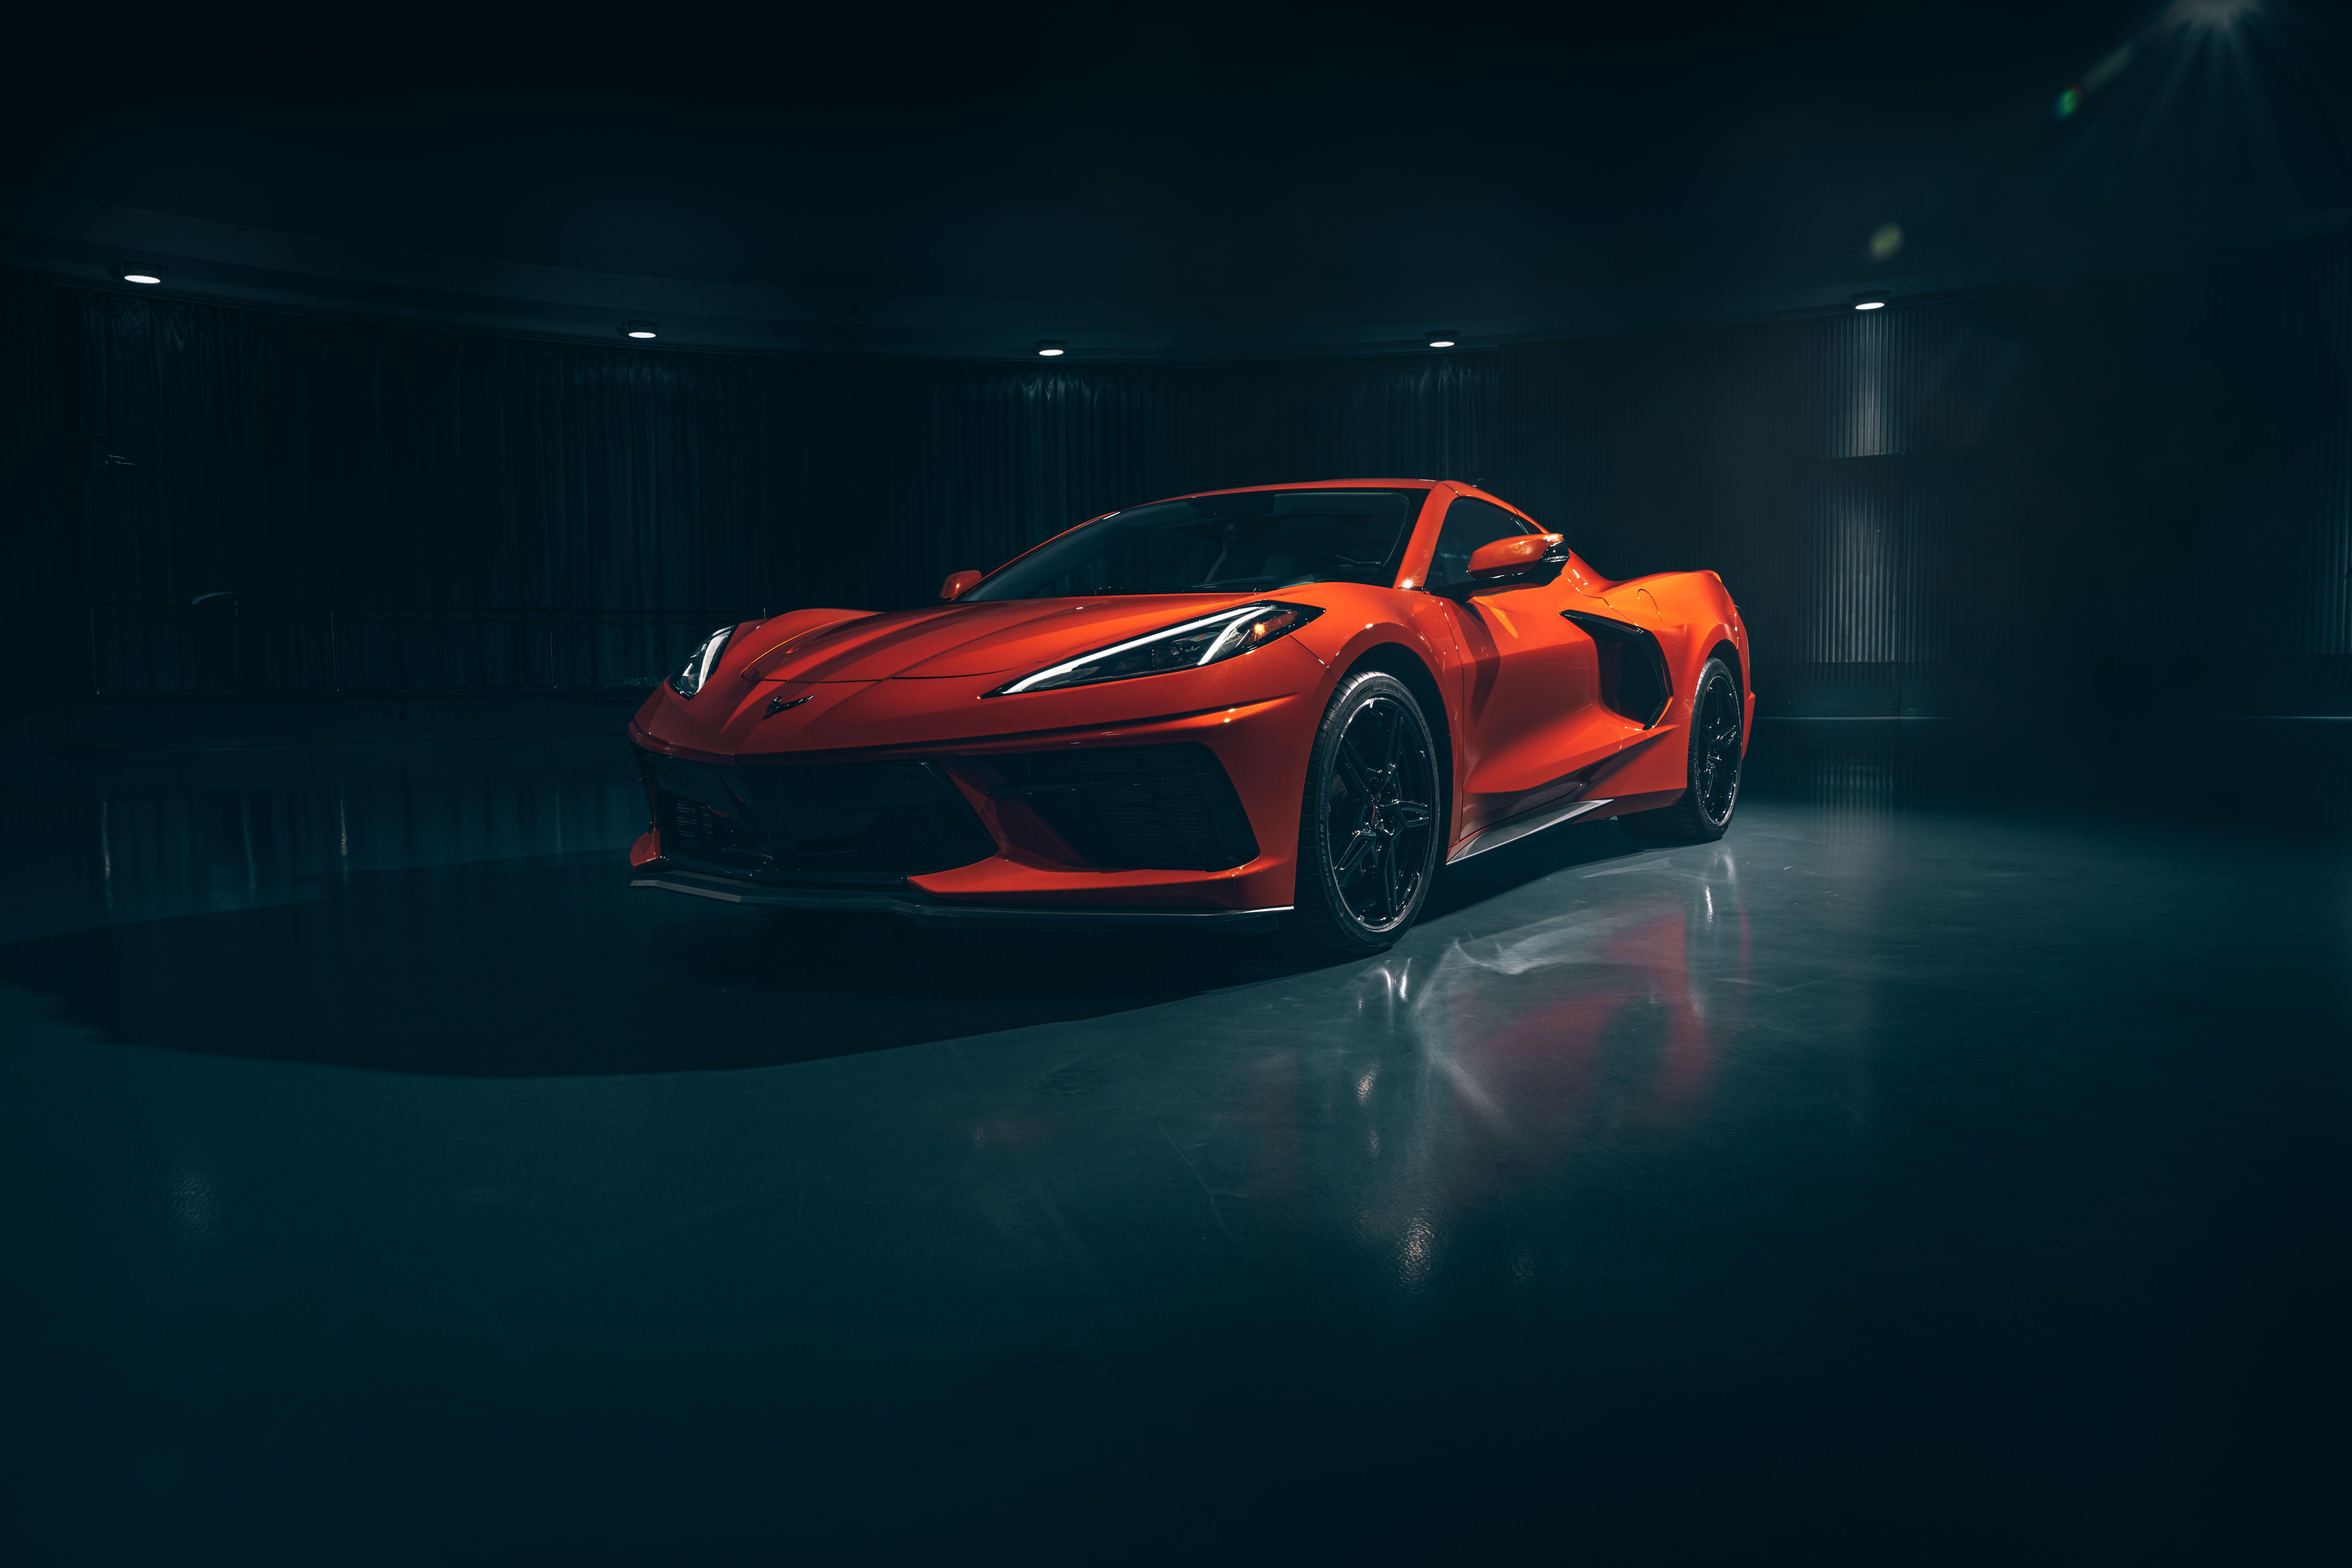 2020 Chevy Corvette Stingray C8, HD Cars, 4k Wallpapers ...